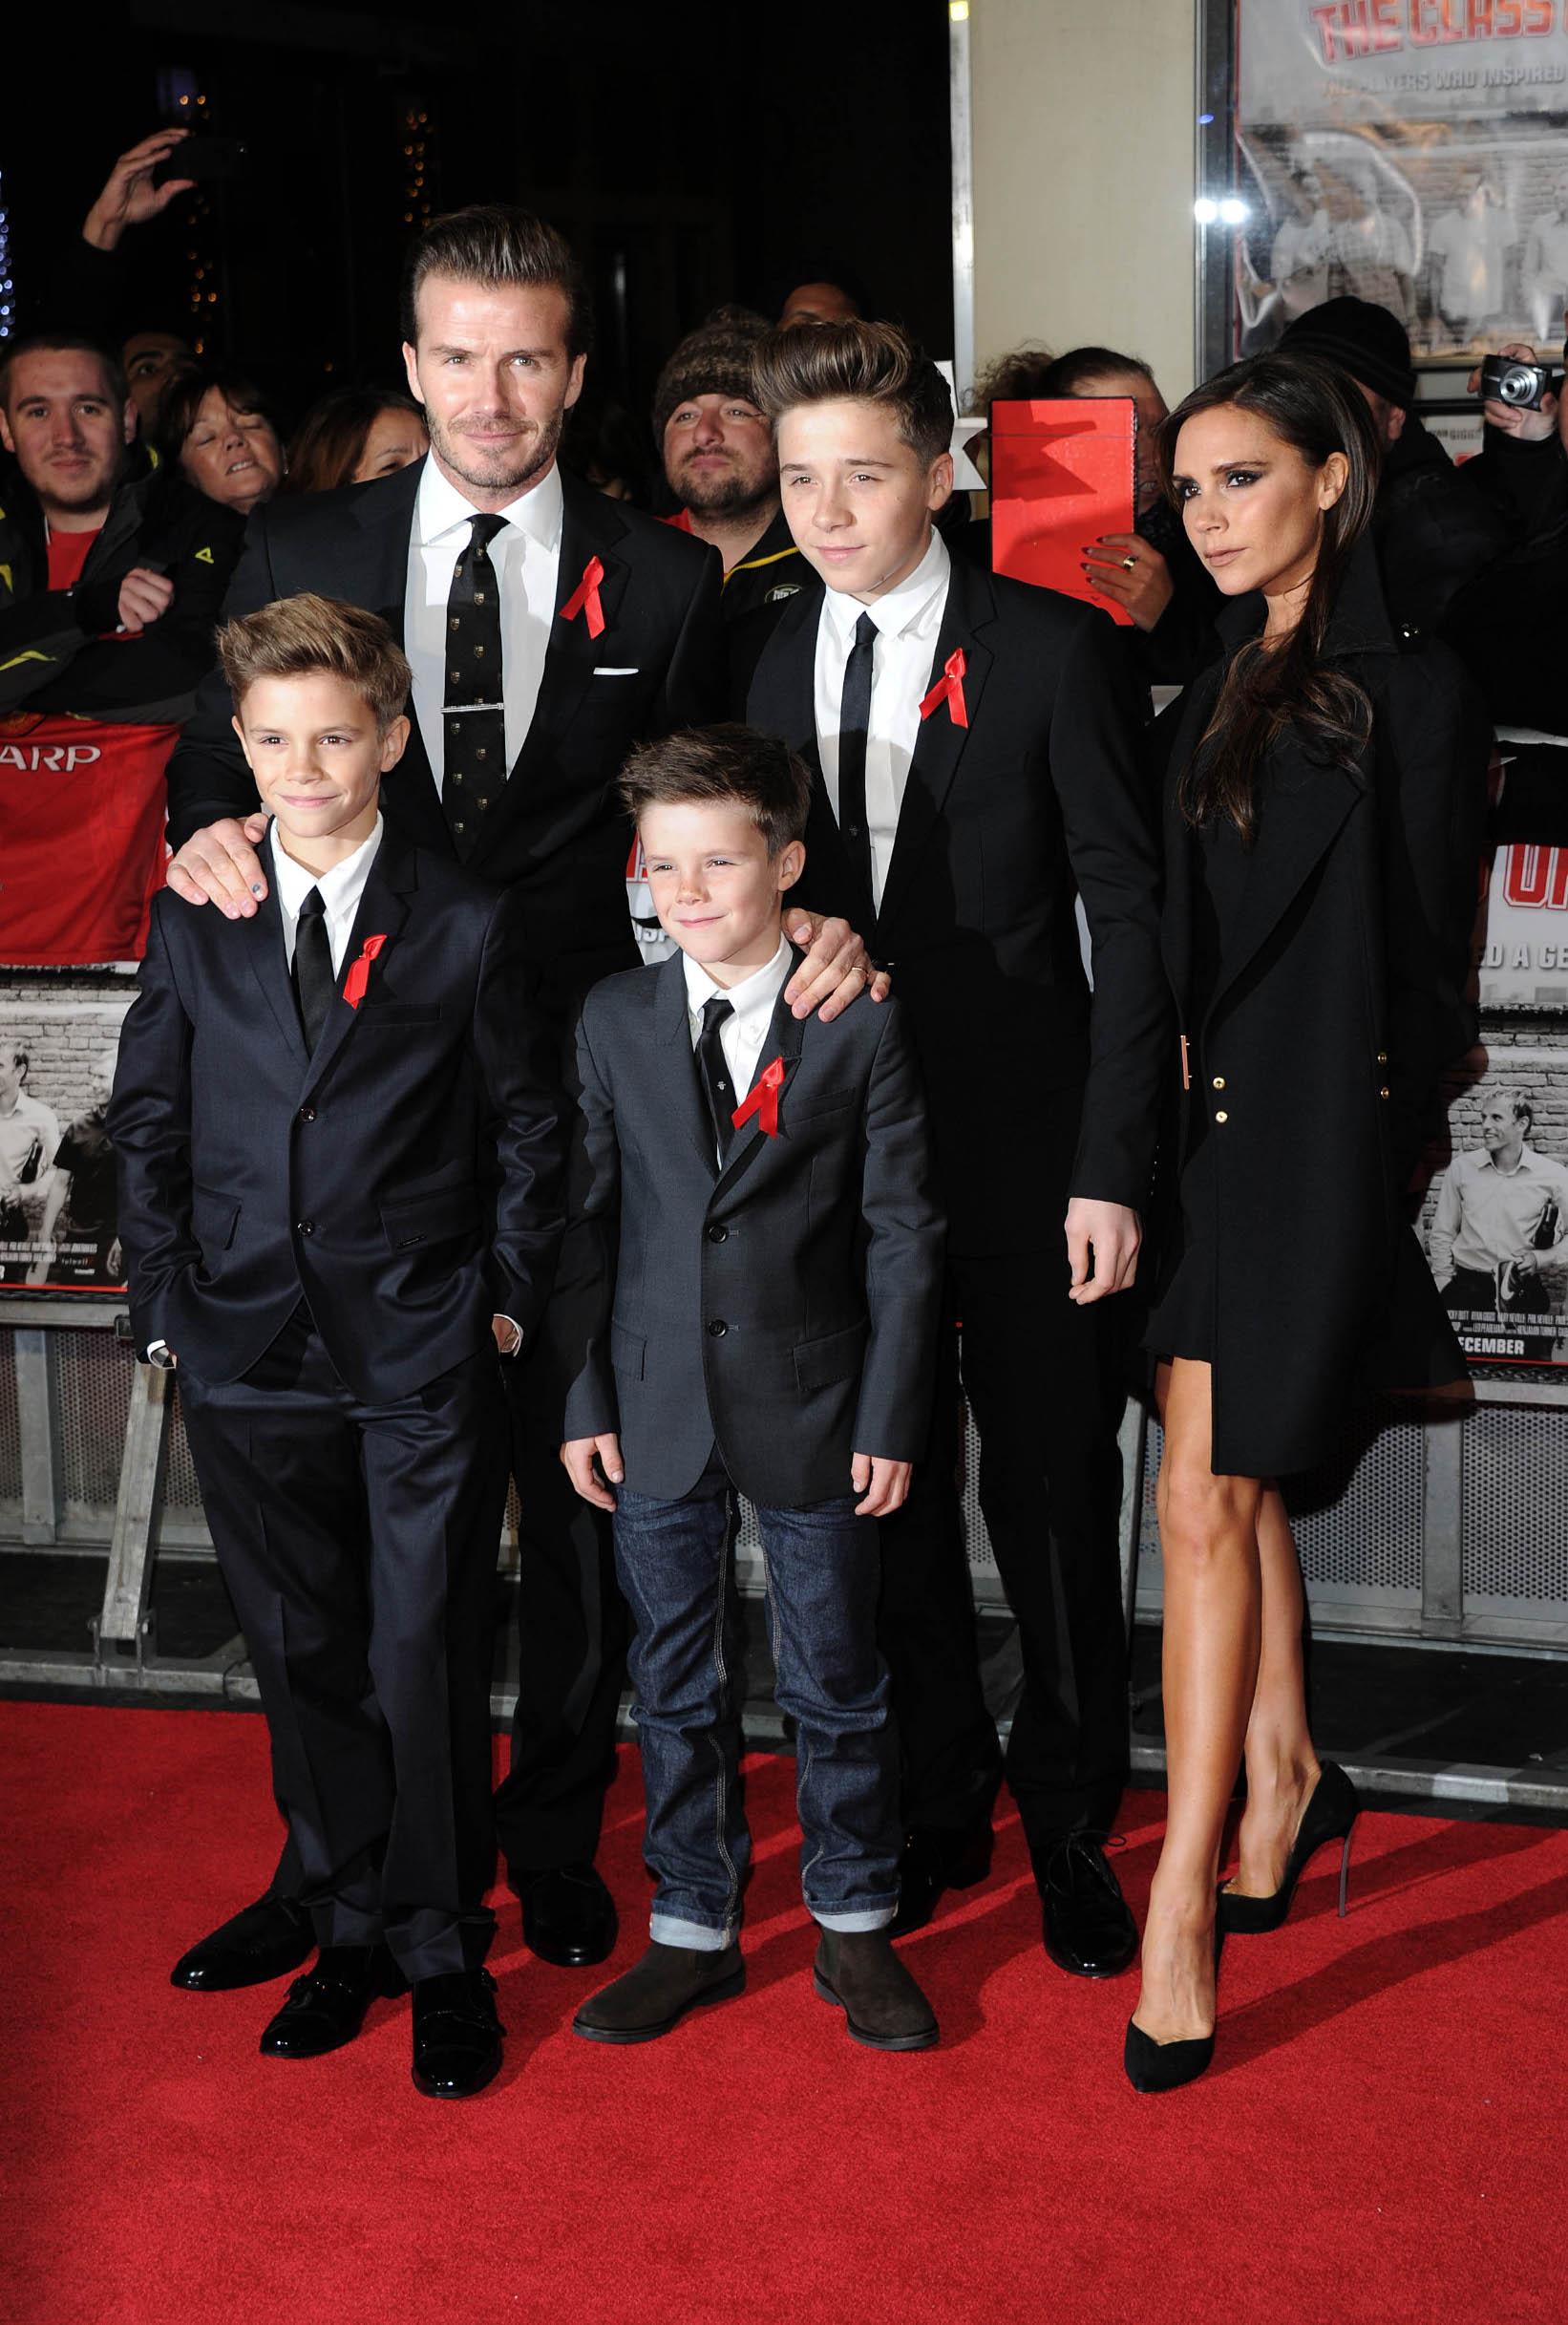 LONDON, UNITED KINGDOM - DECEMBER 01: (L-R) Romeo Beckham, David Beckham, Cruz Beckham, Brooklyn Beckham and Victoria Beckham attend the World premiere of